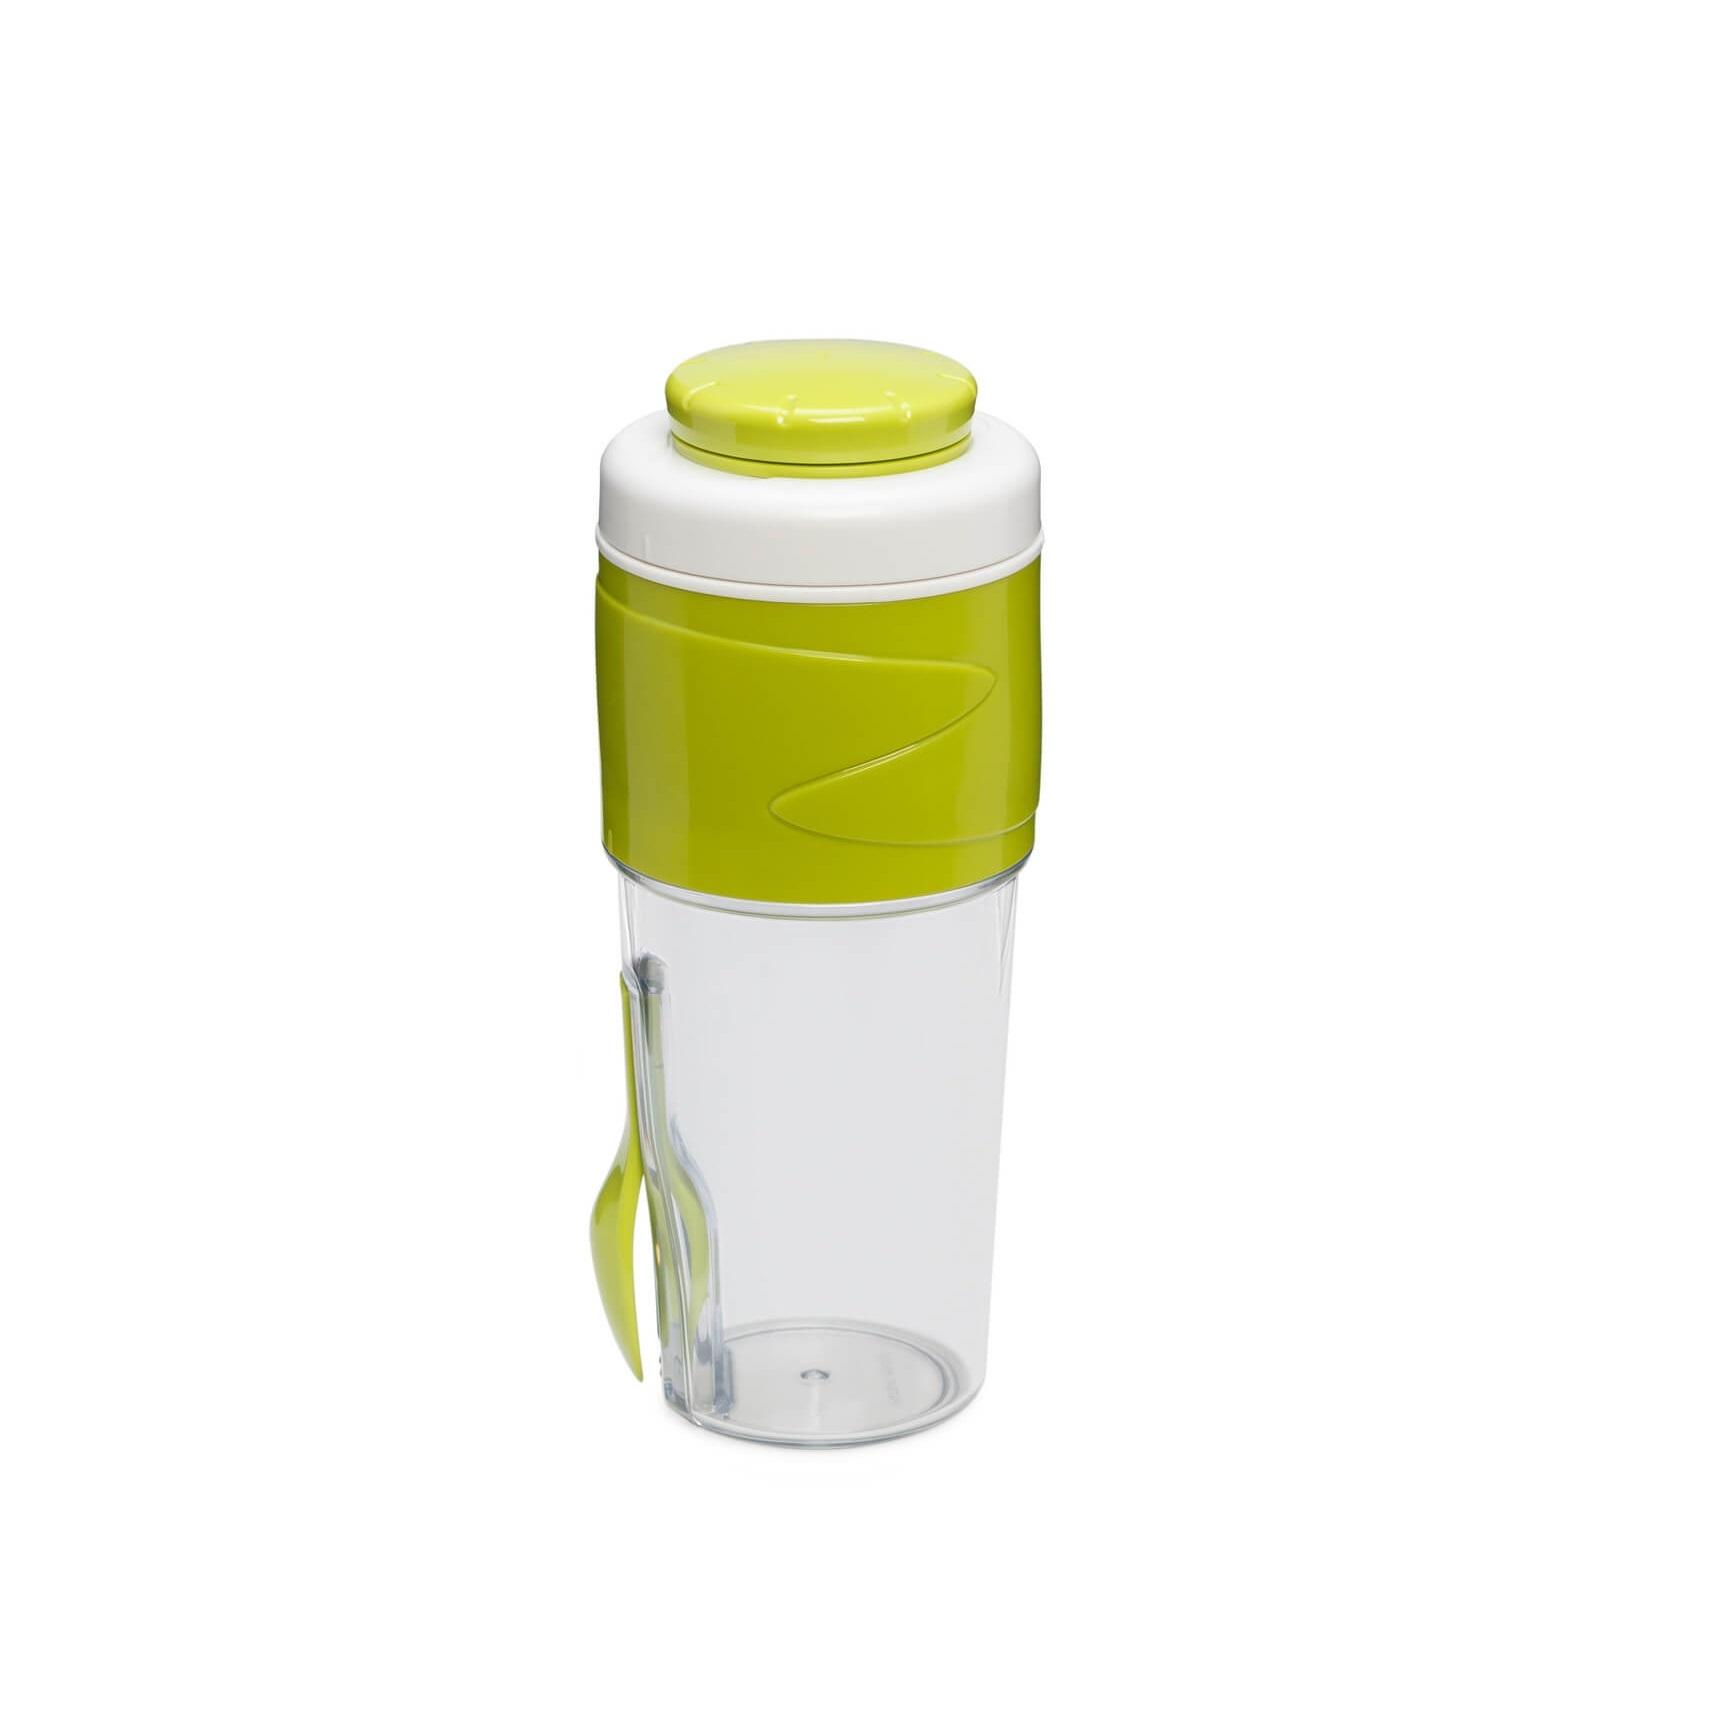 Переносная спиралерезка-стакан Konstar KS-223 салатовая